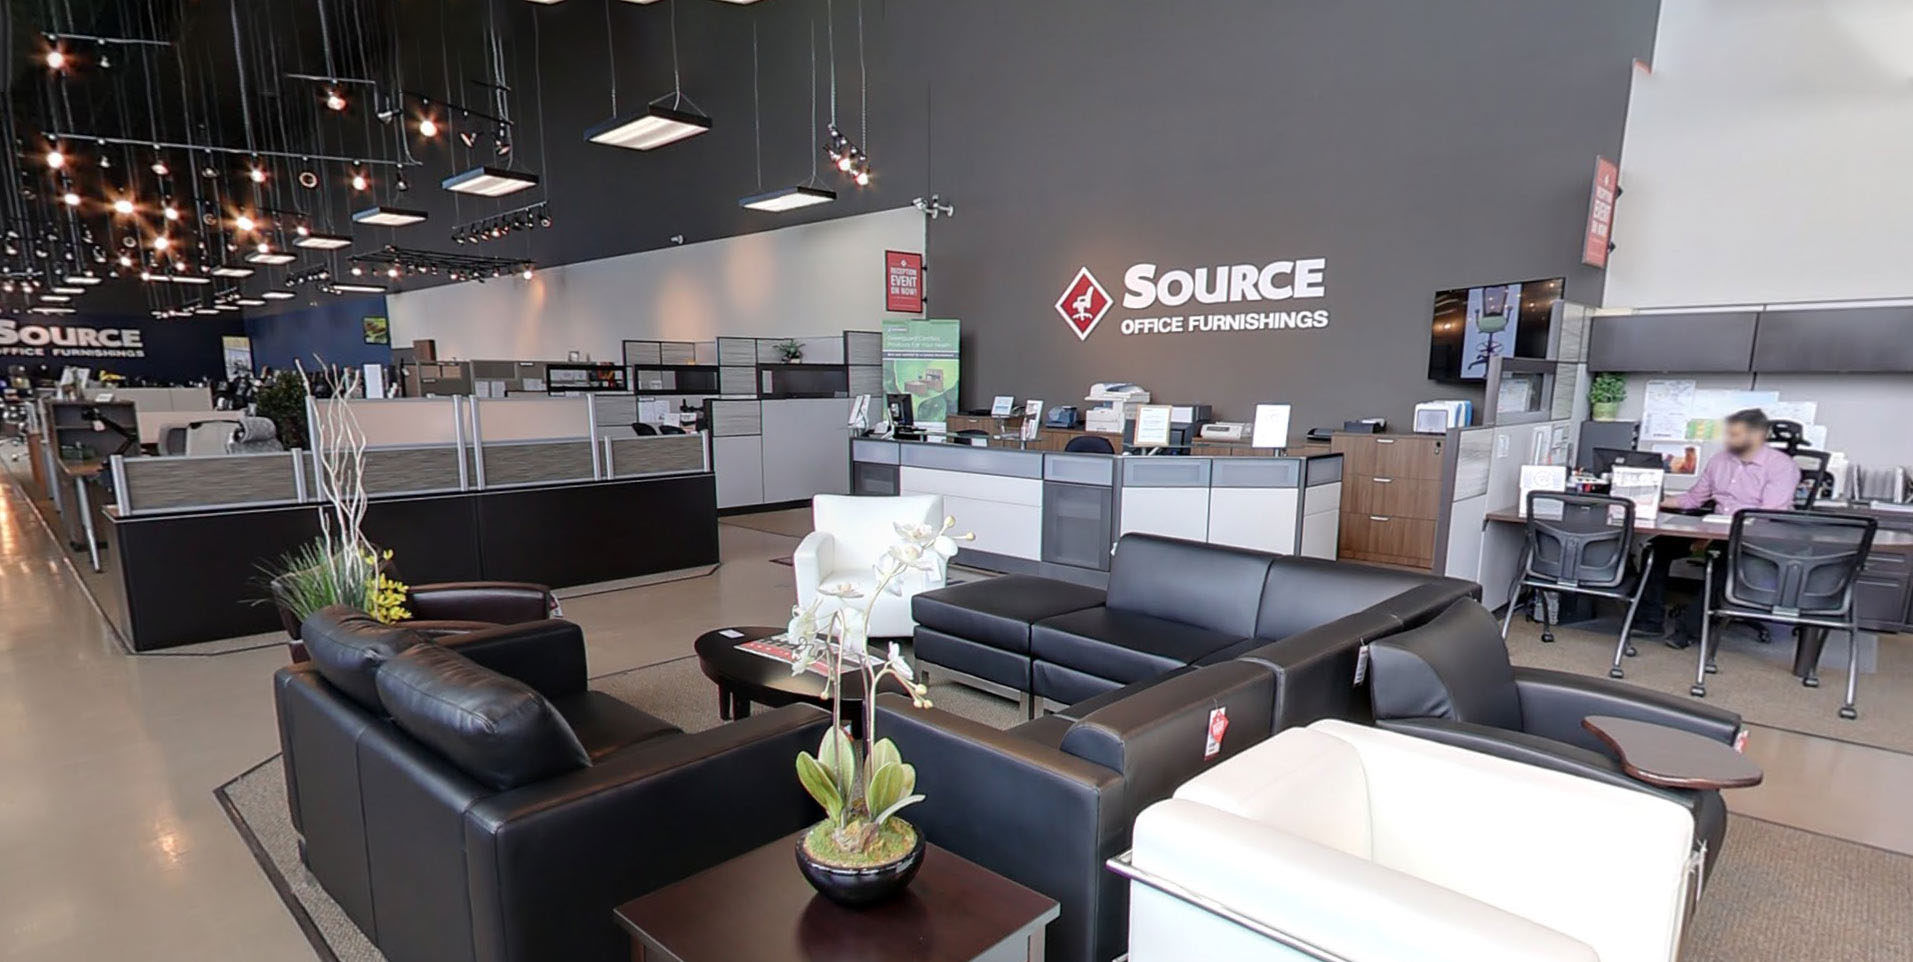 Source Office Furniture Brampton Store